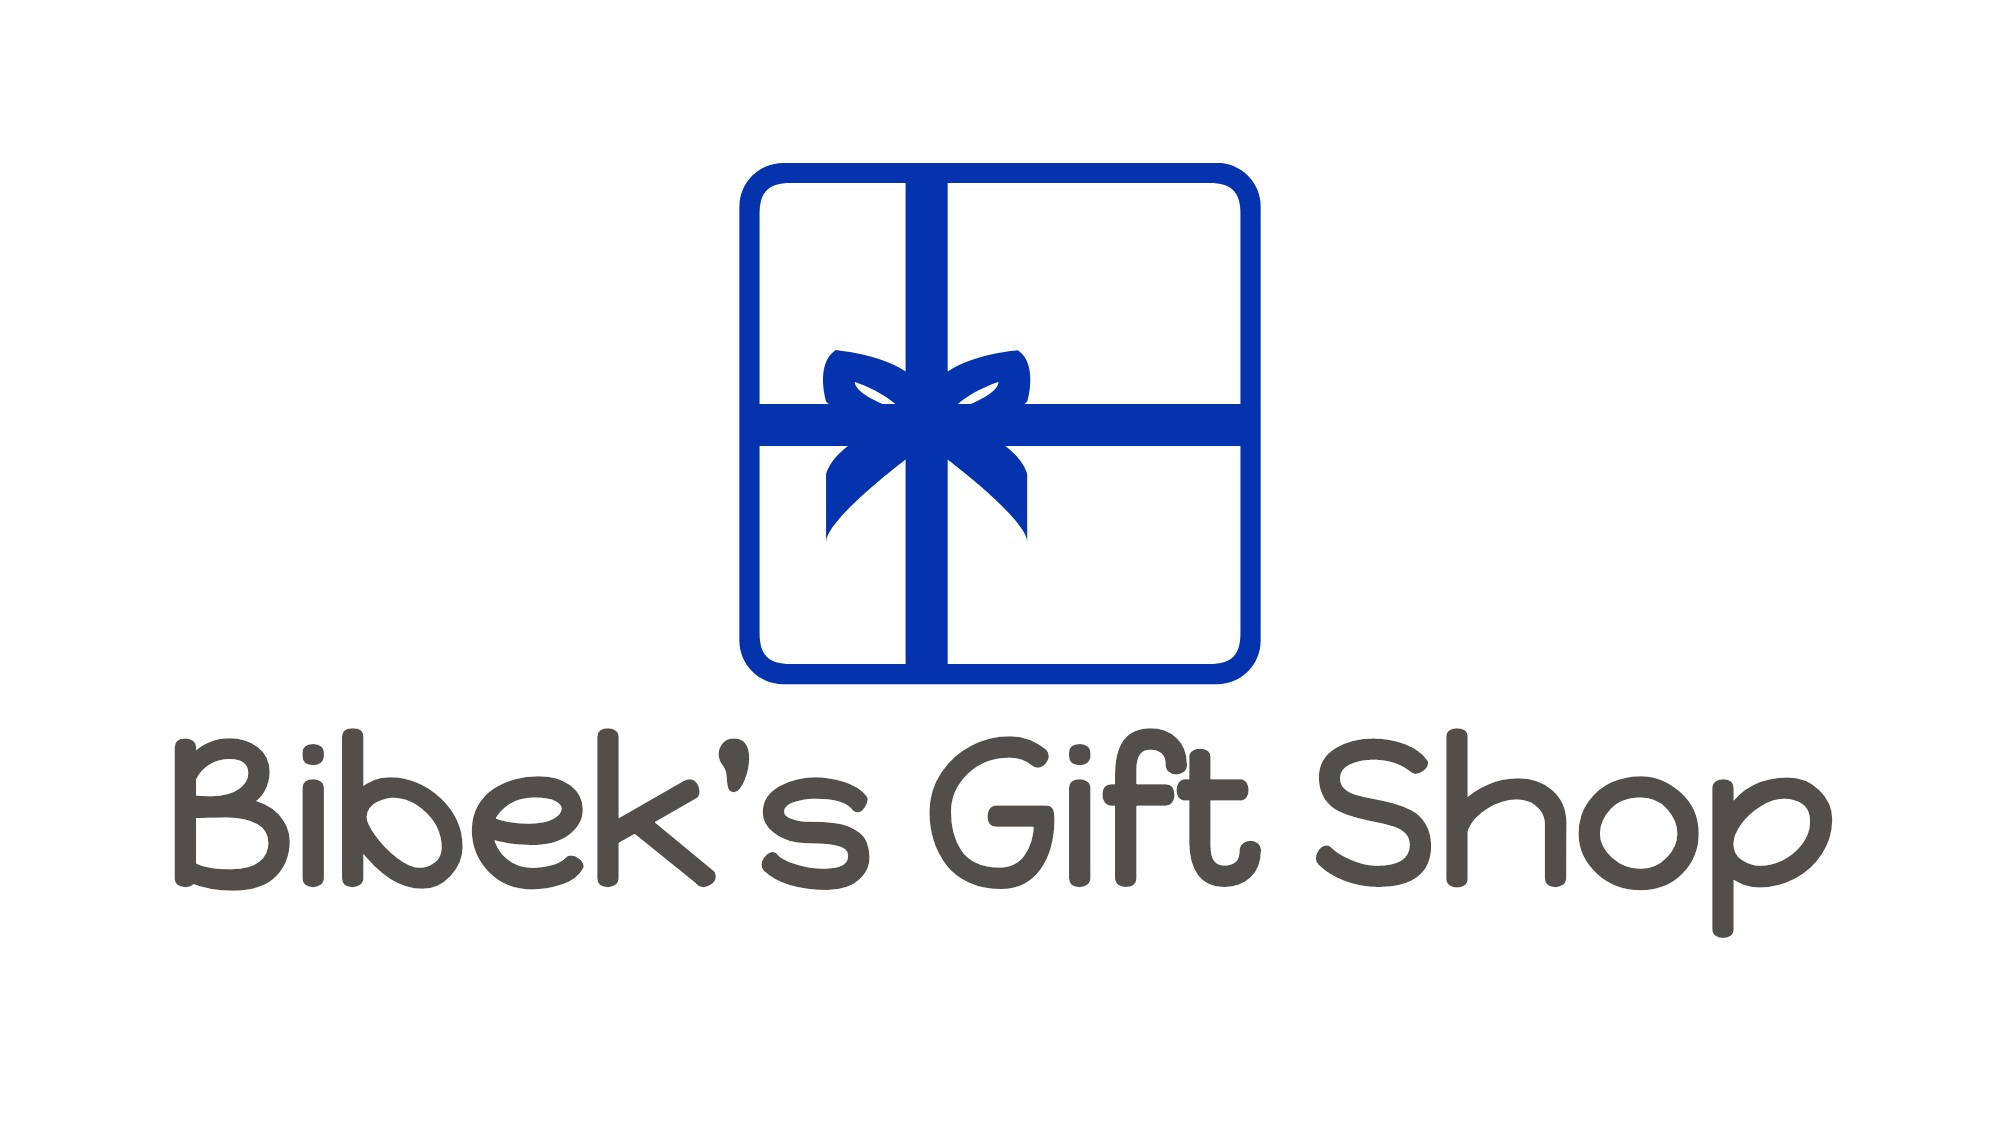 Bibek's Gift Shop